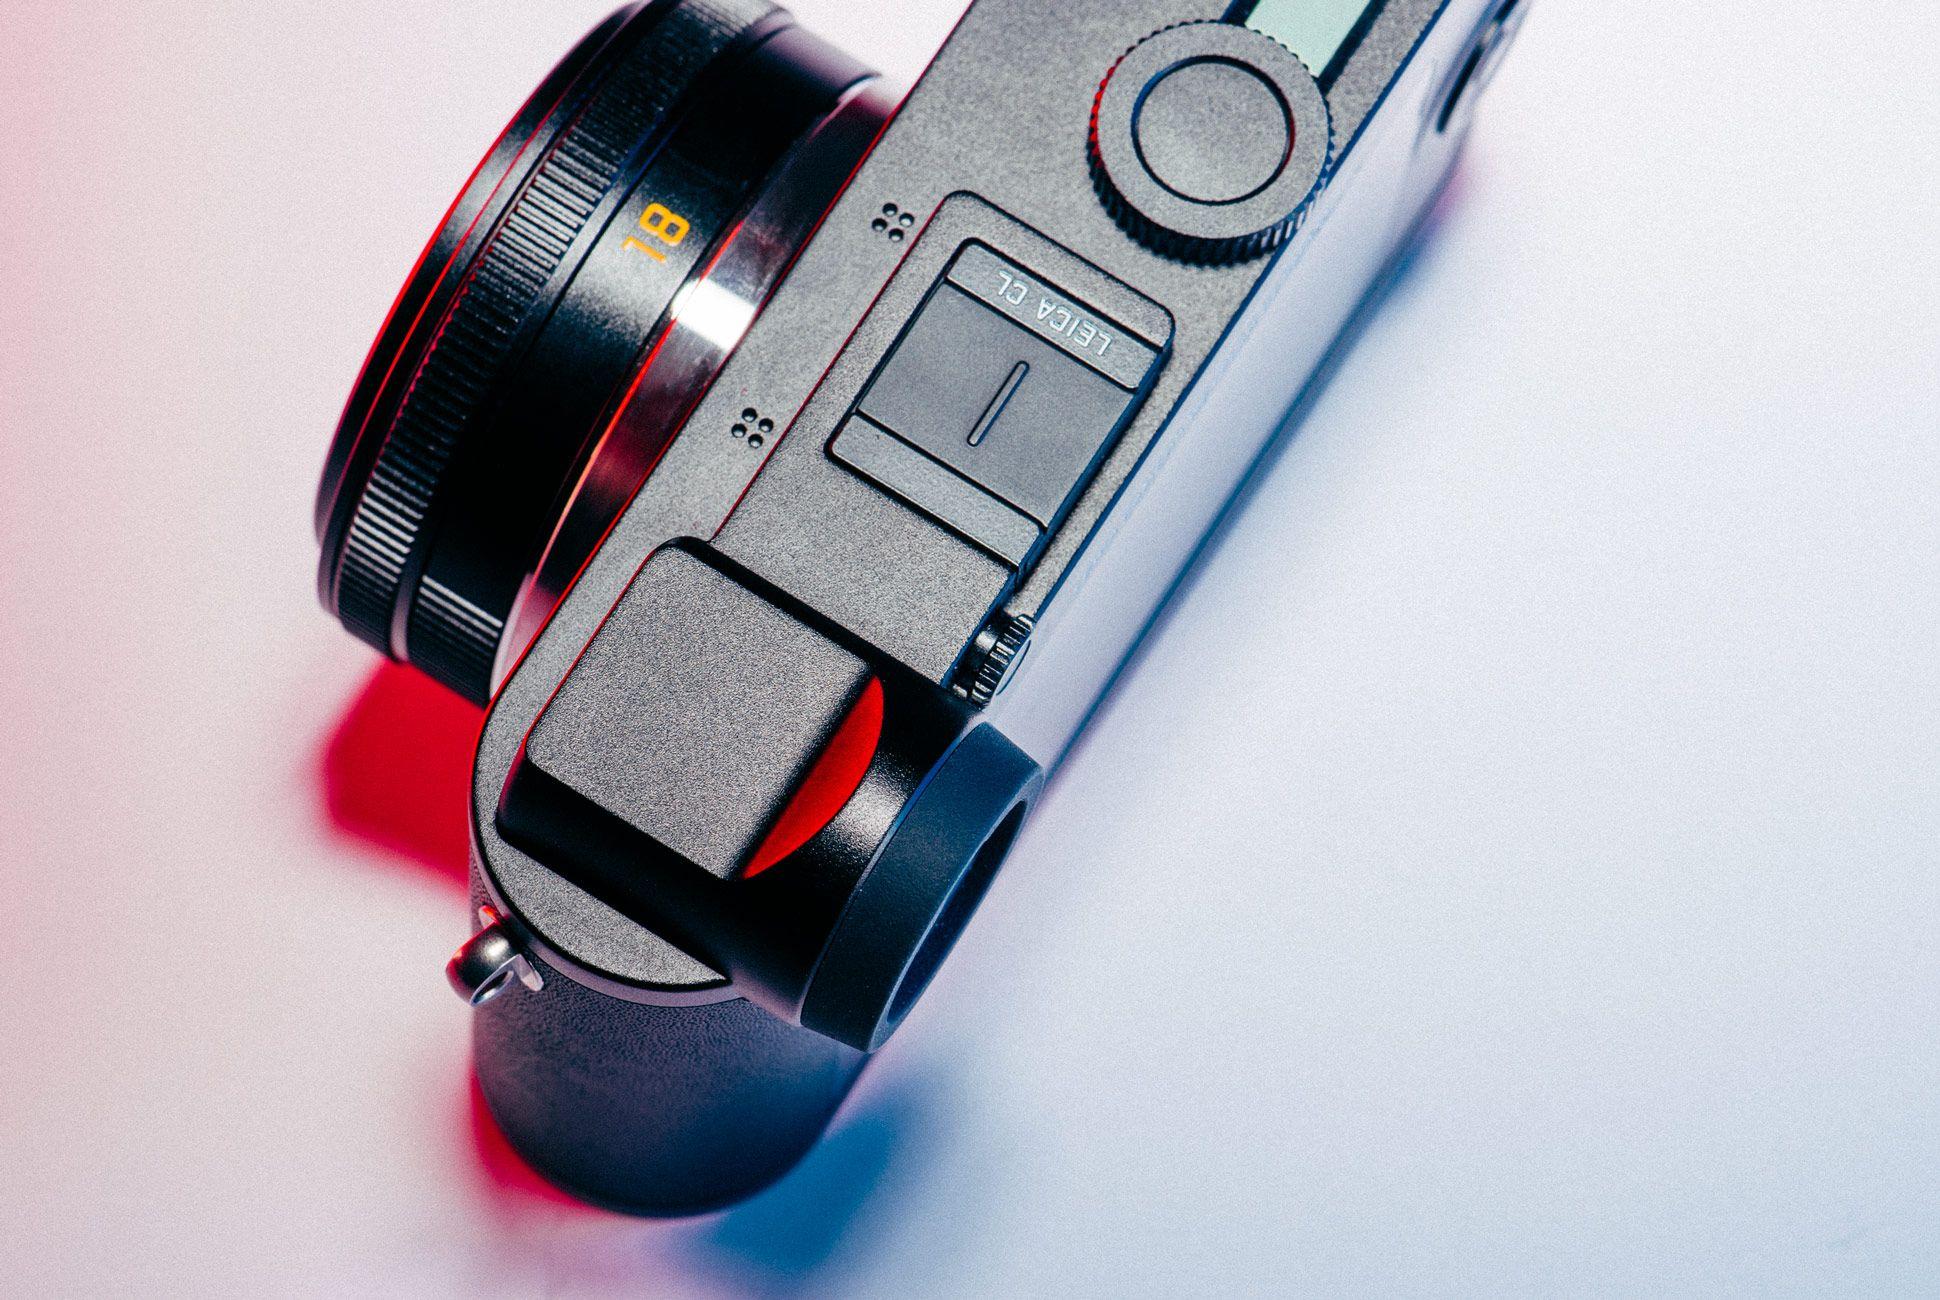 Leica-CL-Gear-Patrol-Slide-9